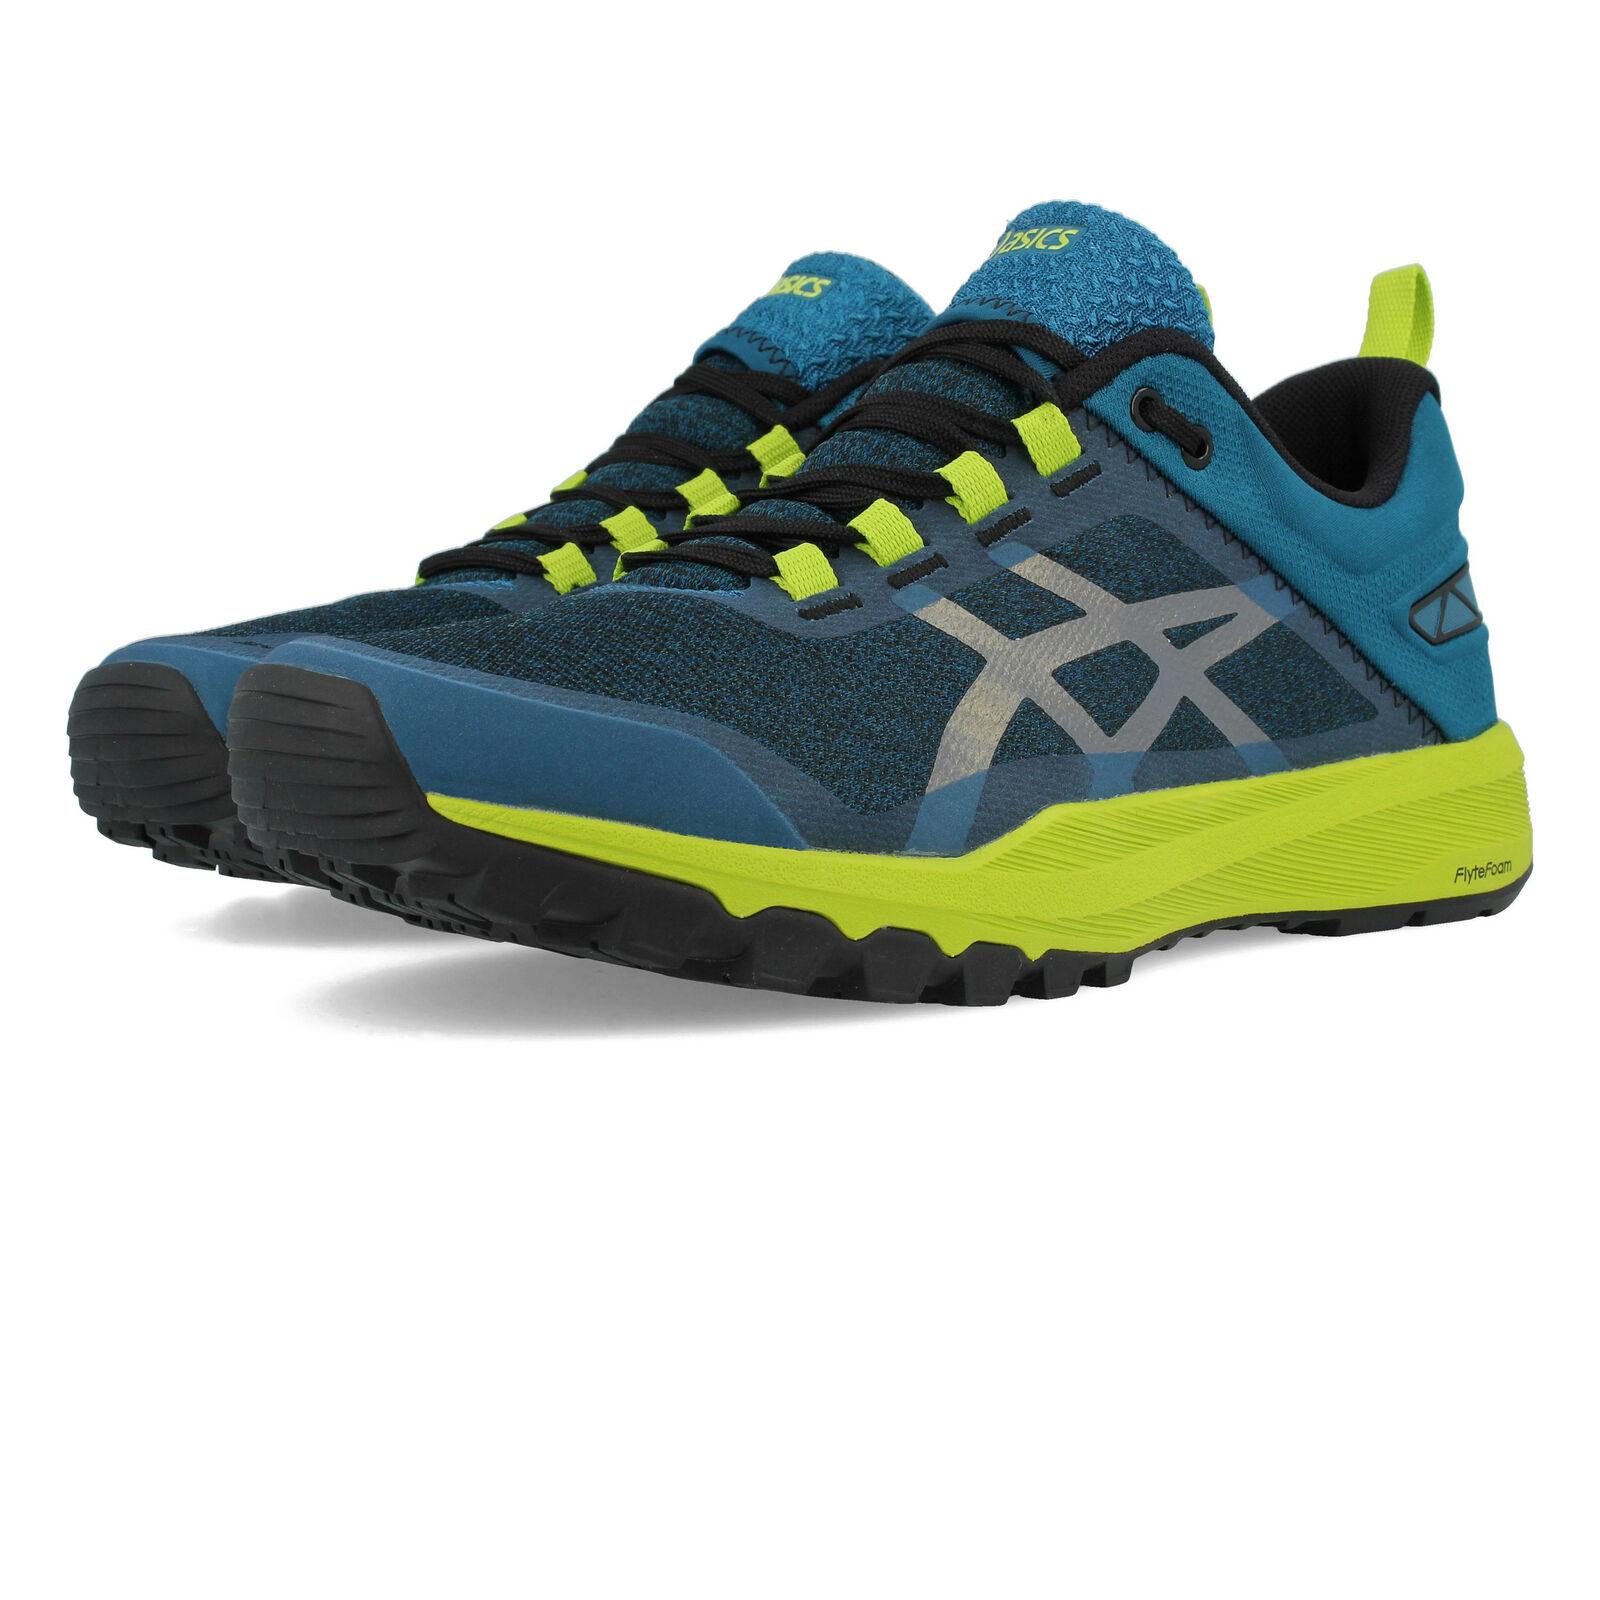 Asics mannens Gecko XT Trail hardlopen schoenen Trainers sportschoenen blauw groen Navy Sports